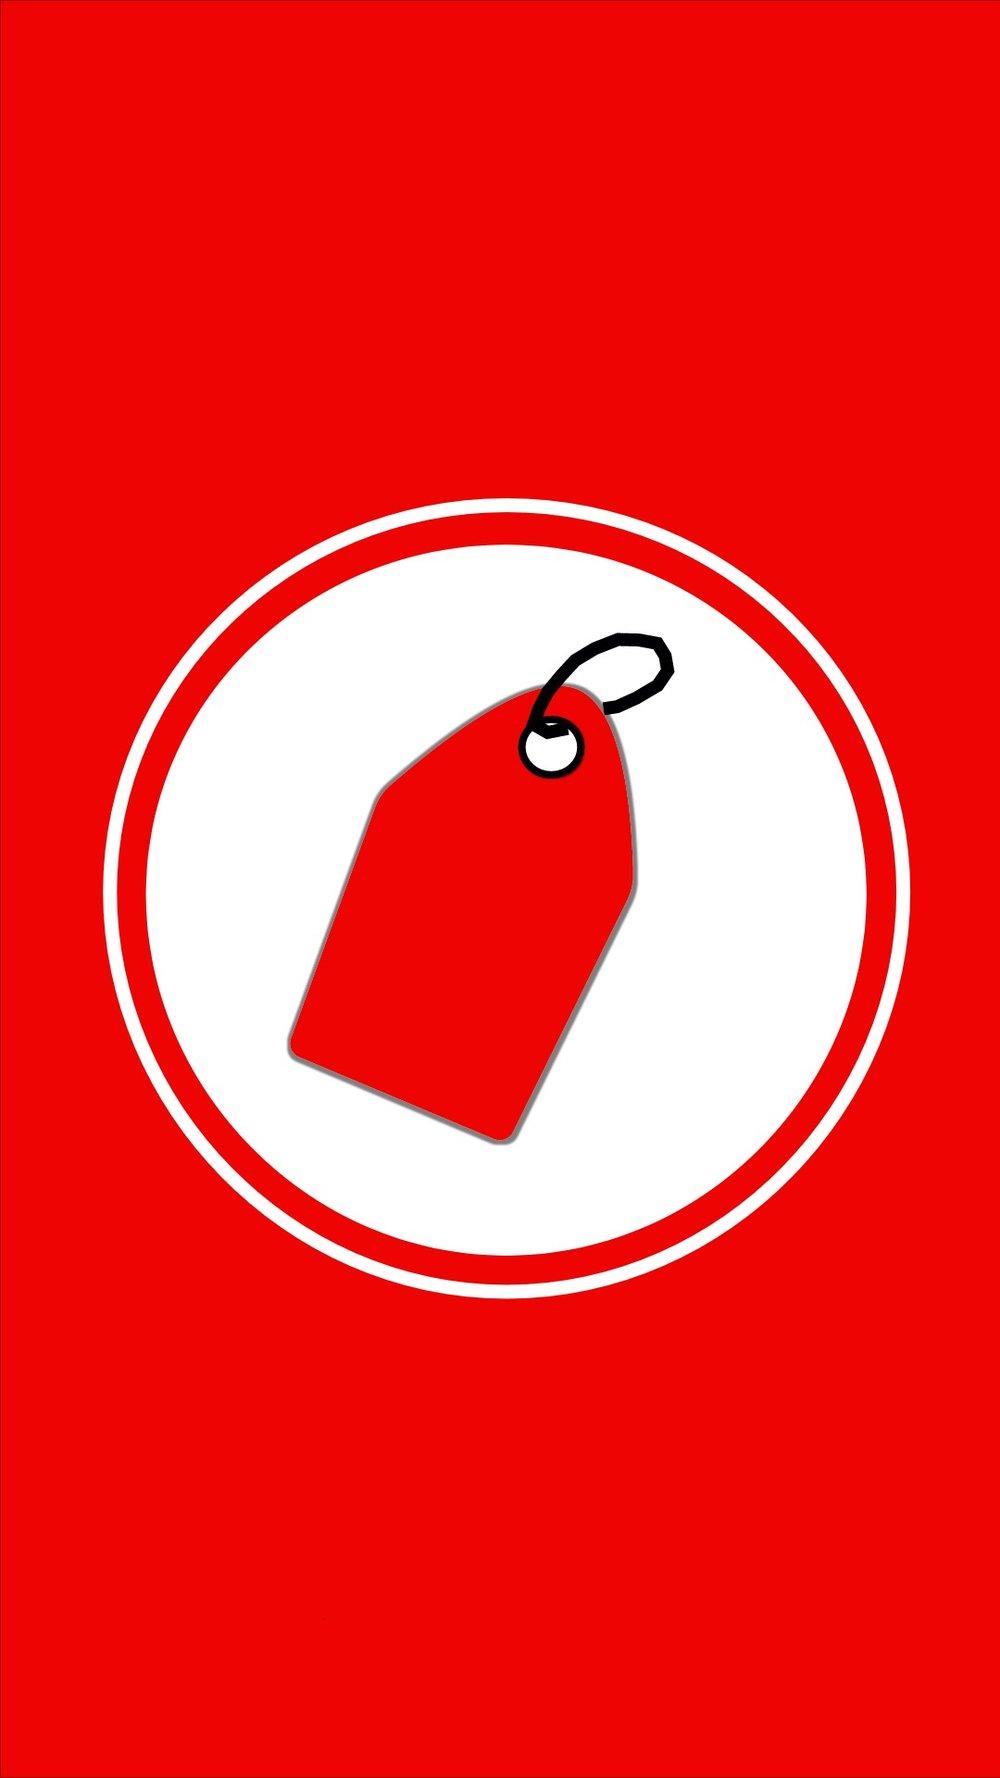 Instagram-cover-tag-red-lotnotes.com.jpg